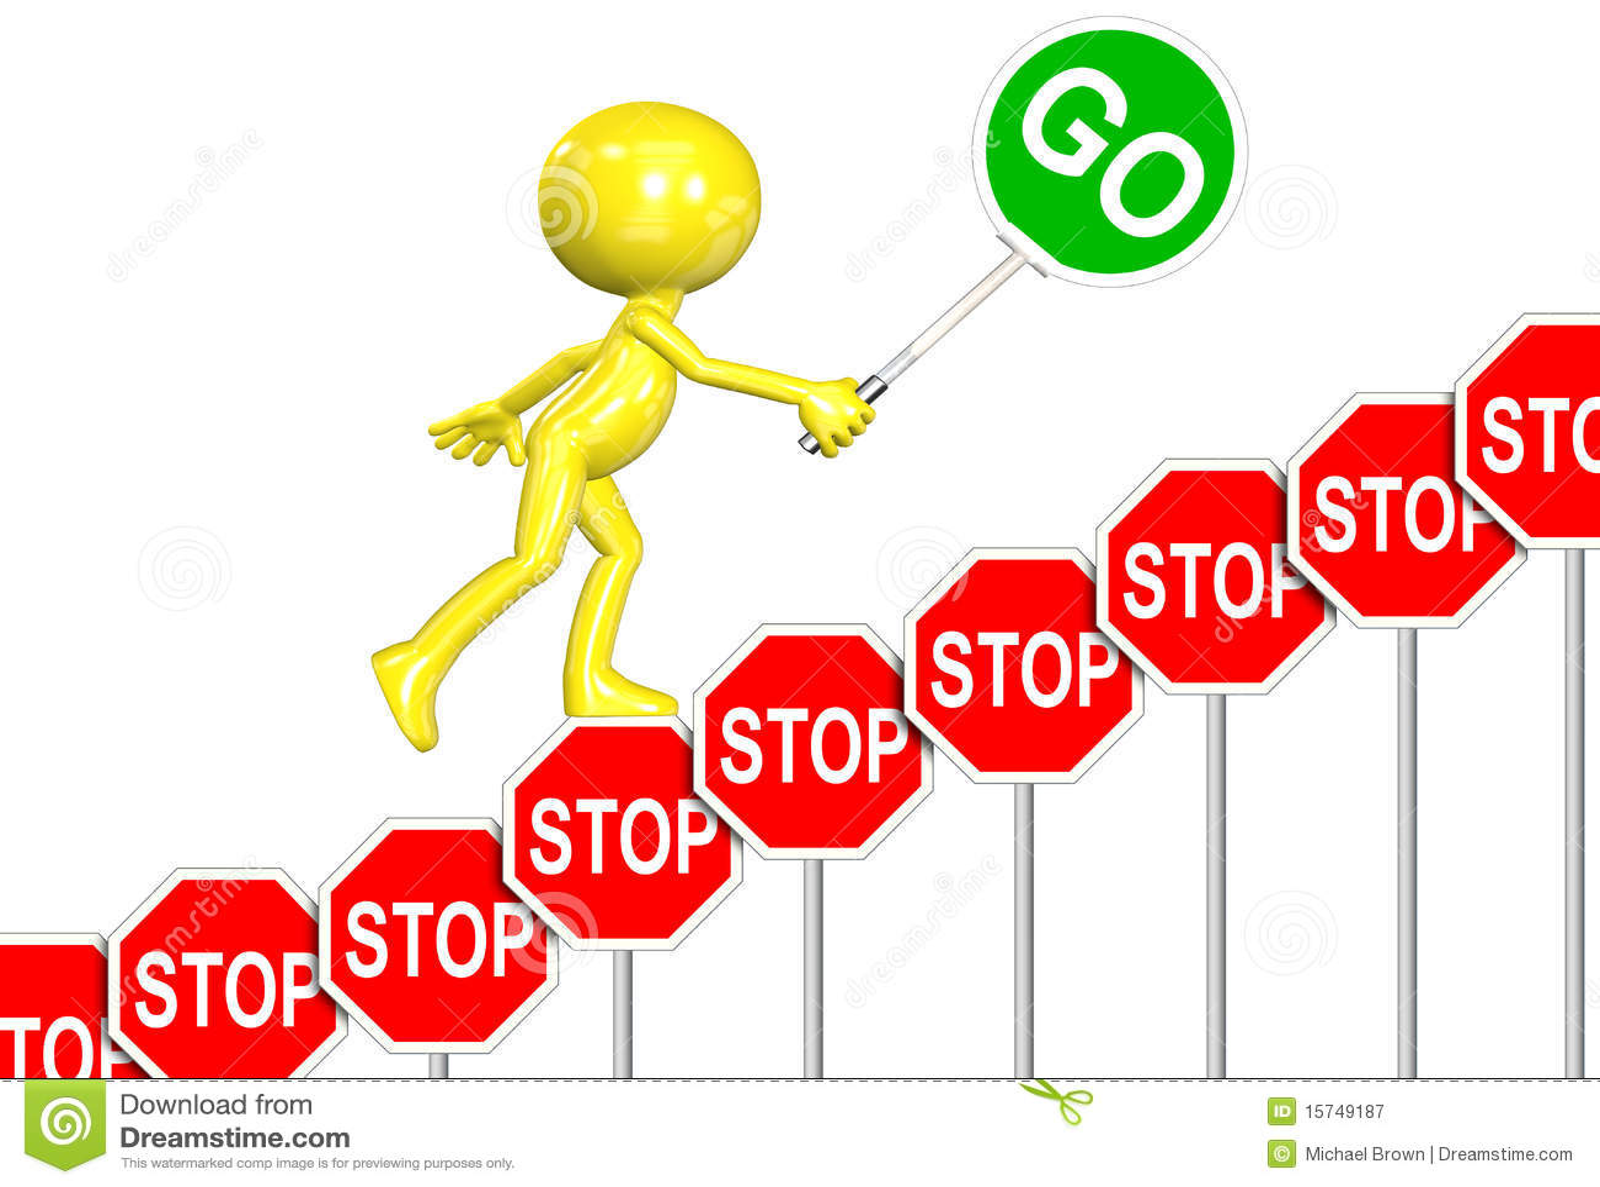 stop signs go sign progress 3d man cartoon royalty free